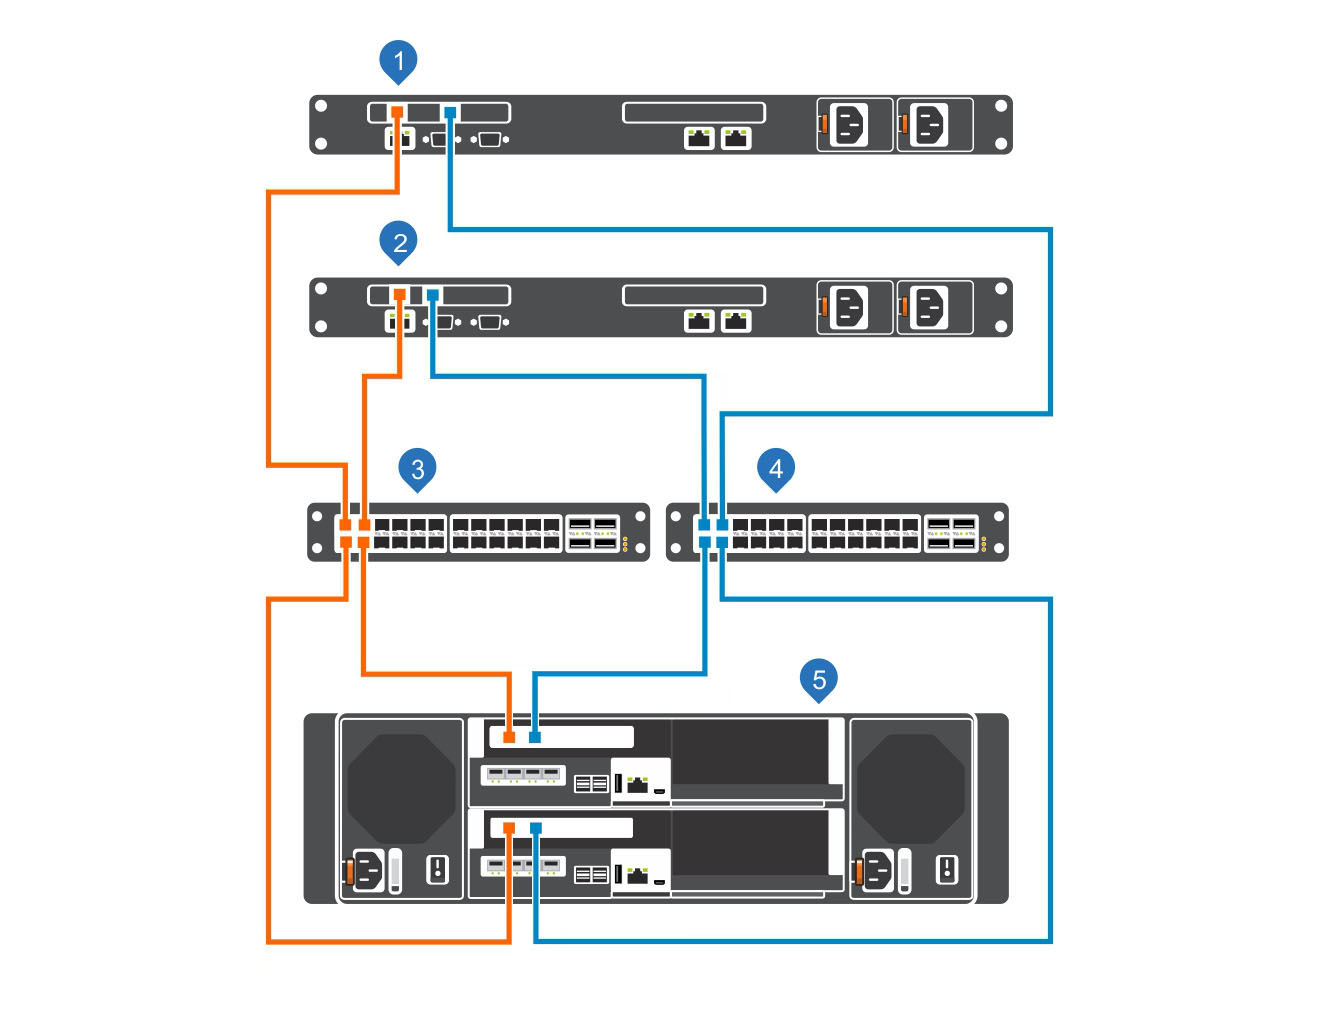 SCv3000 and SCv3020 Storage System Deployment Guide